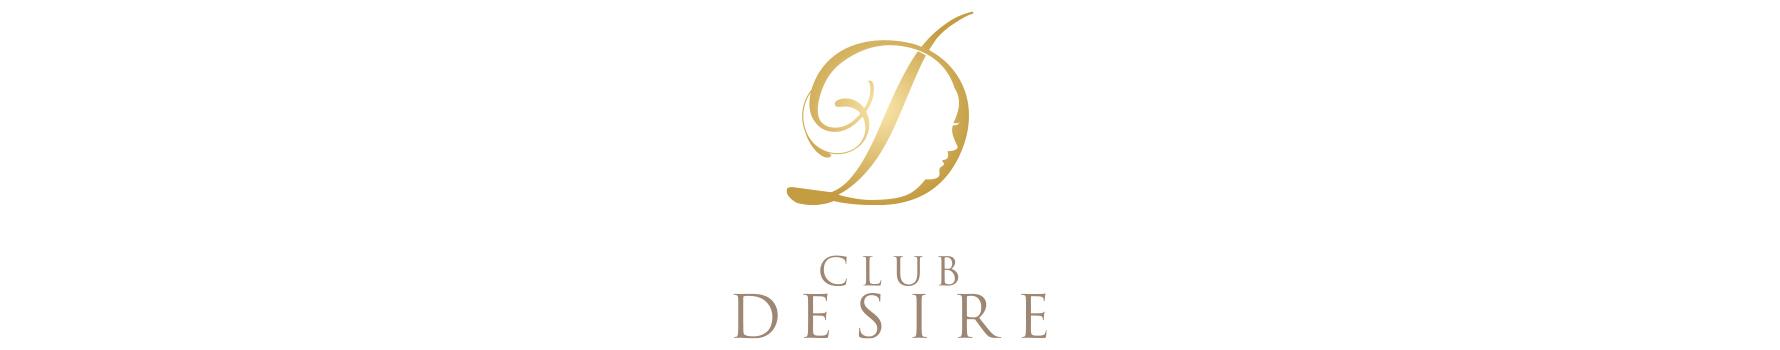 CLUB DESIRE【ディザイア】(新橋)のロゴ